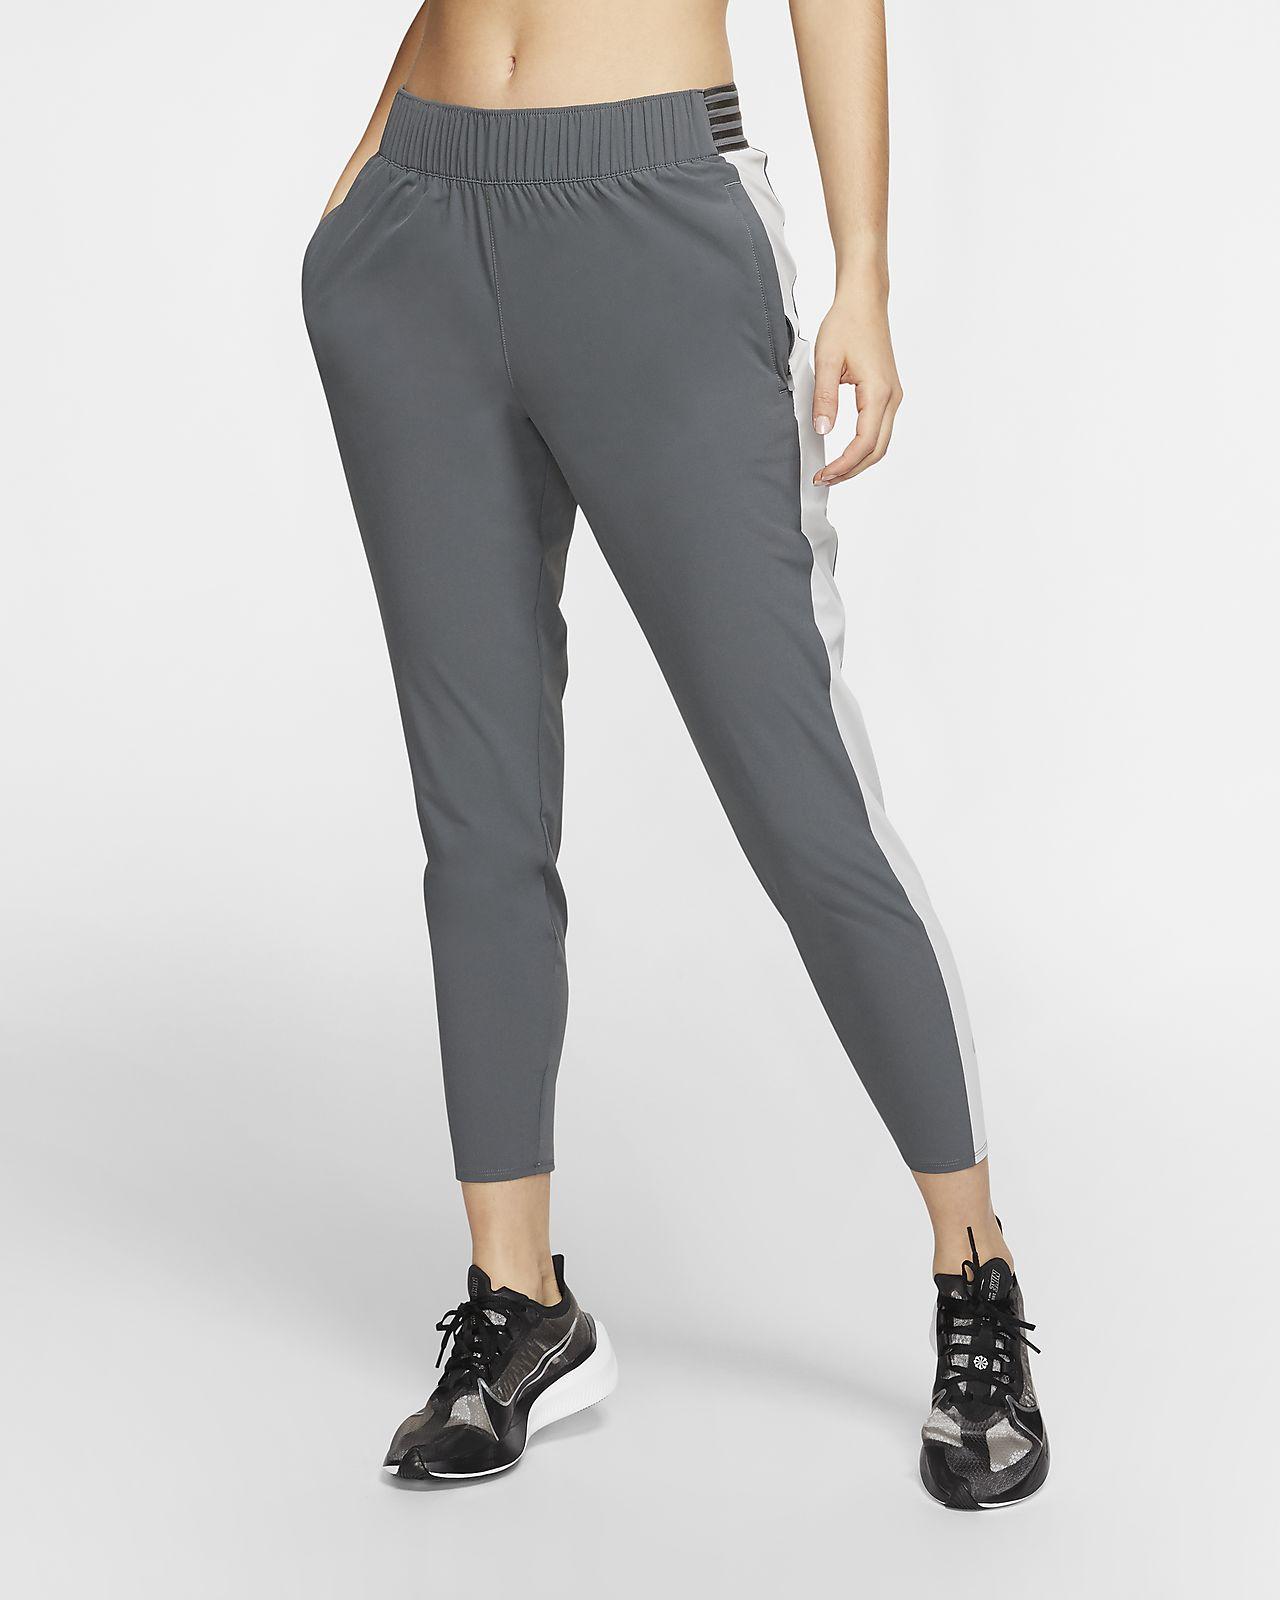 pantalon nike essential femme